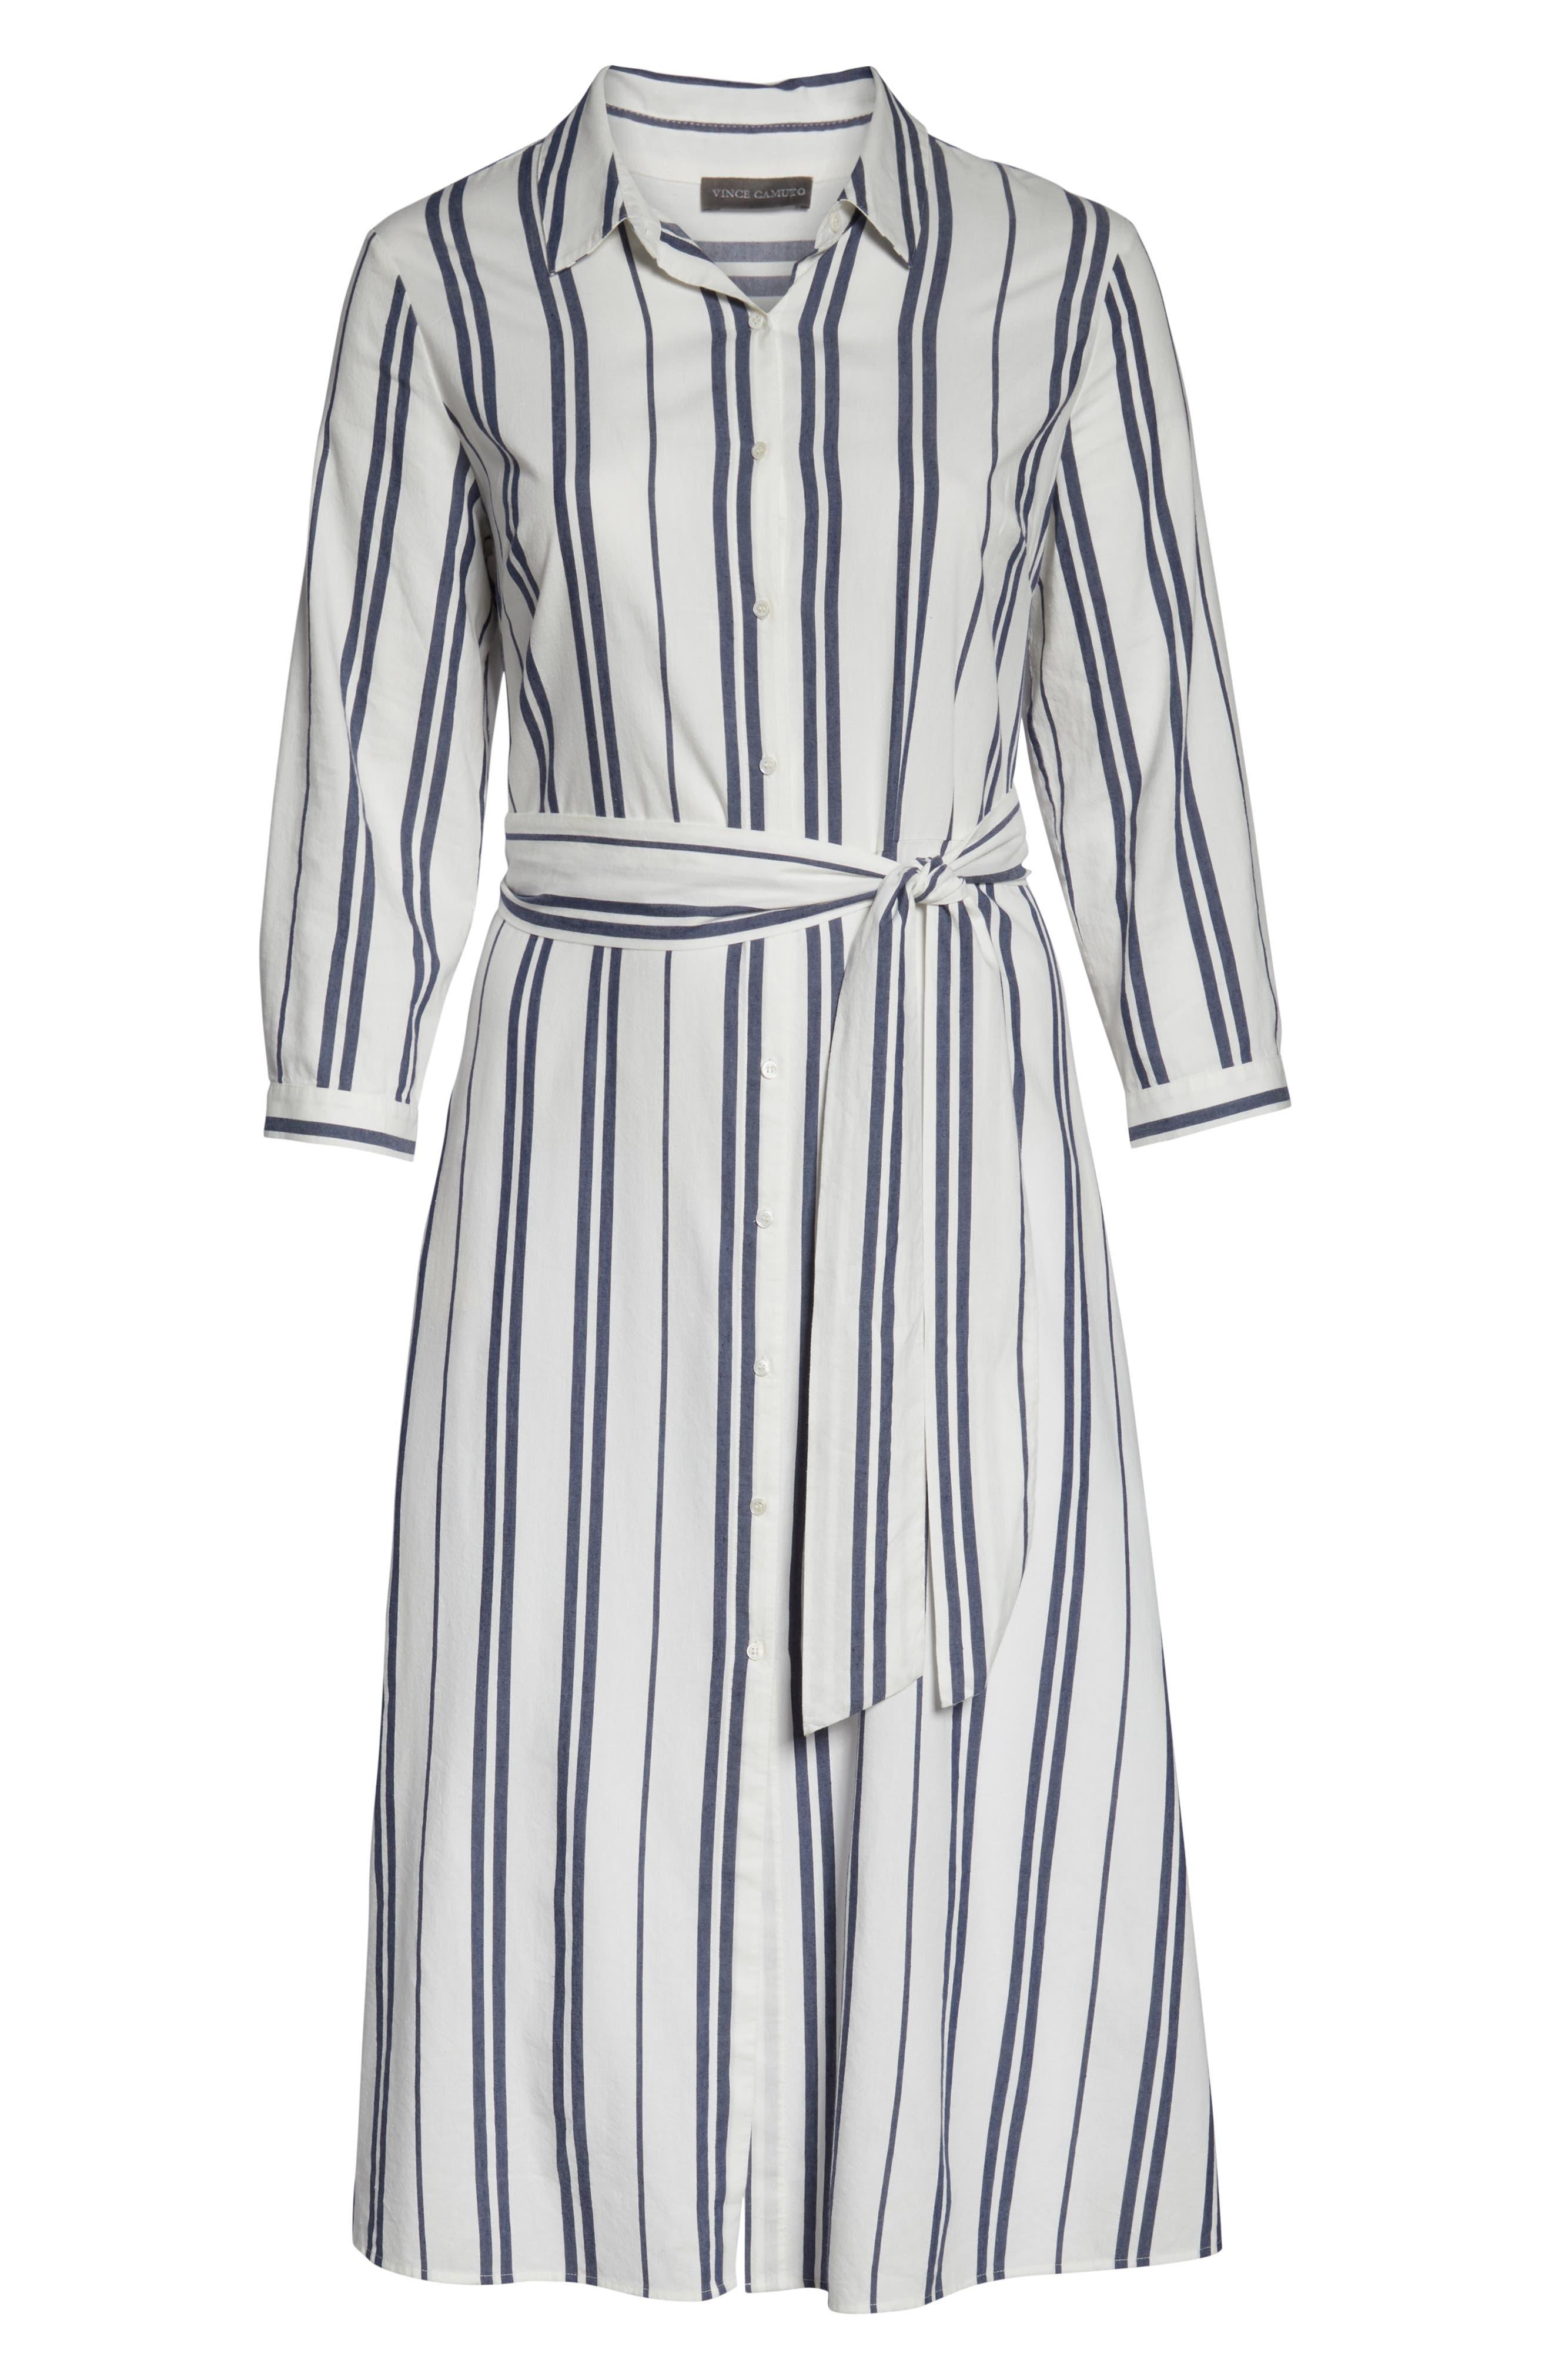 VINCE CAMUTO, Valiant Stripe Midi Shirtdress, Alternate thumbnail 7, color, PEARL IVORY